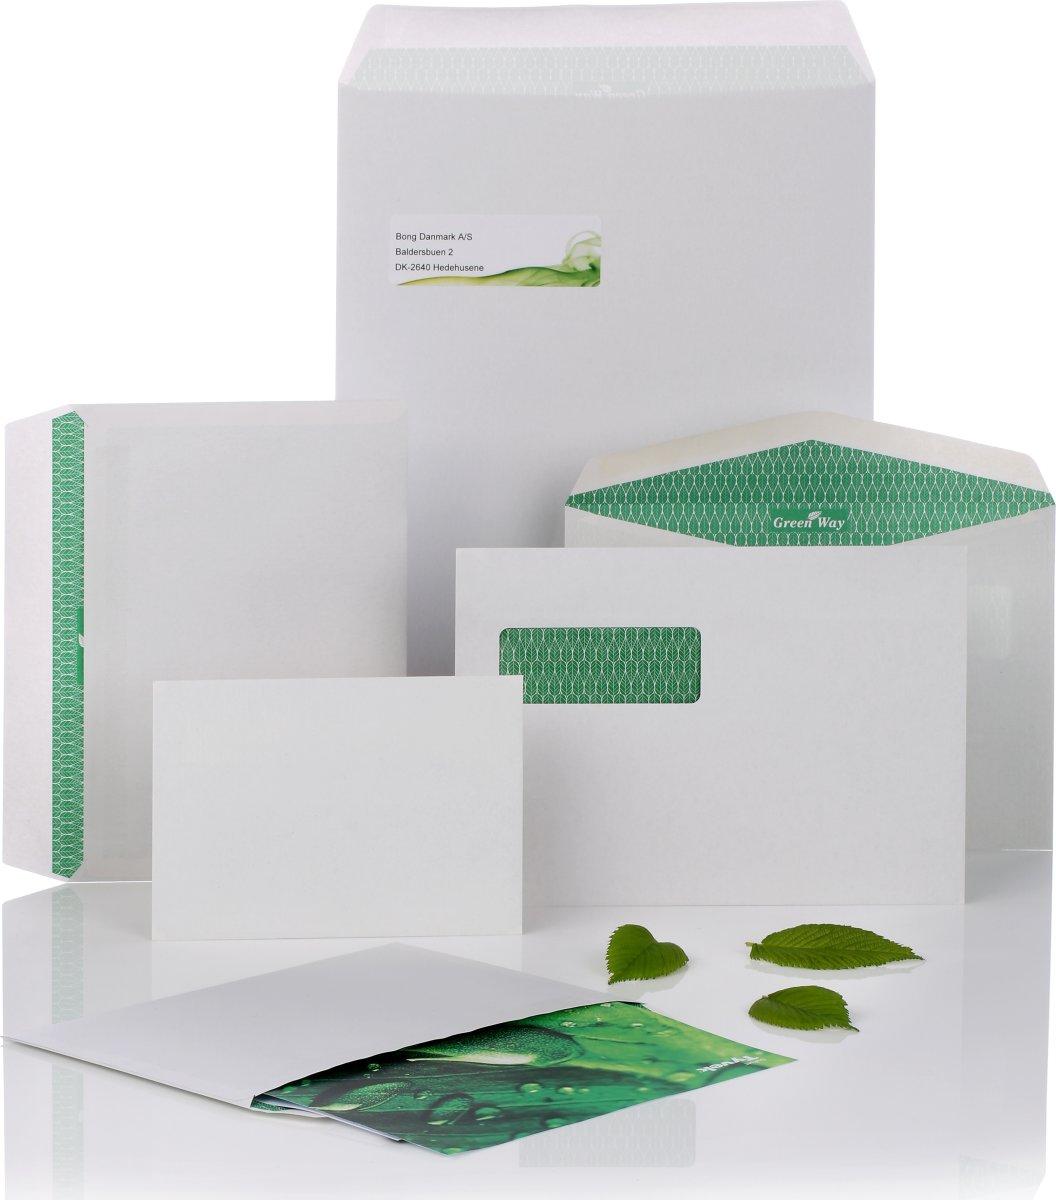 Green Way by Bong Kuvert A5 M5, u/rude